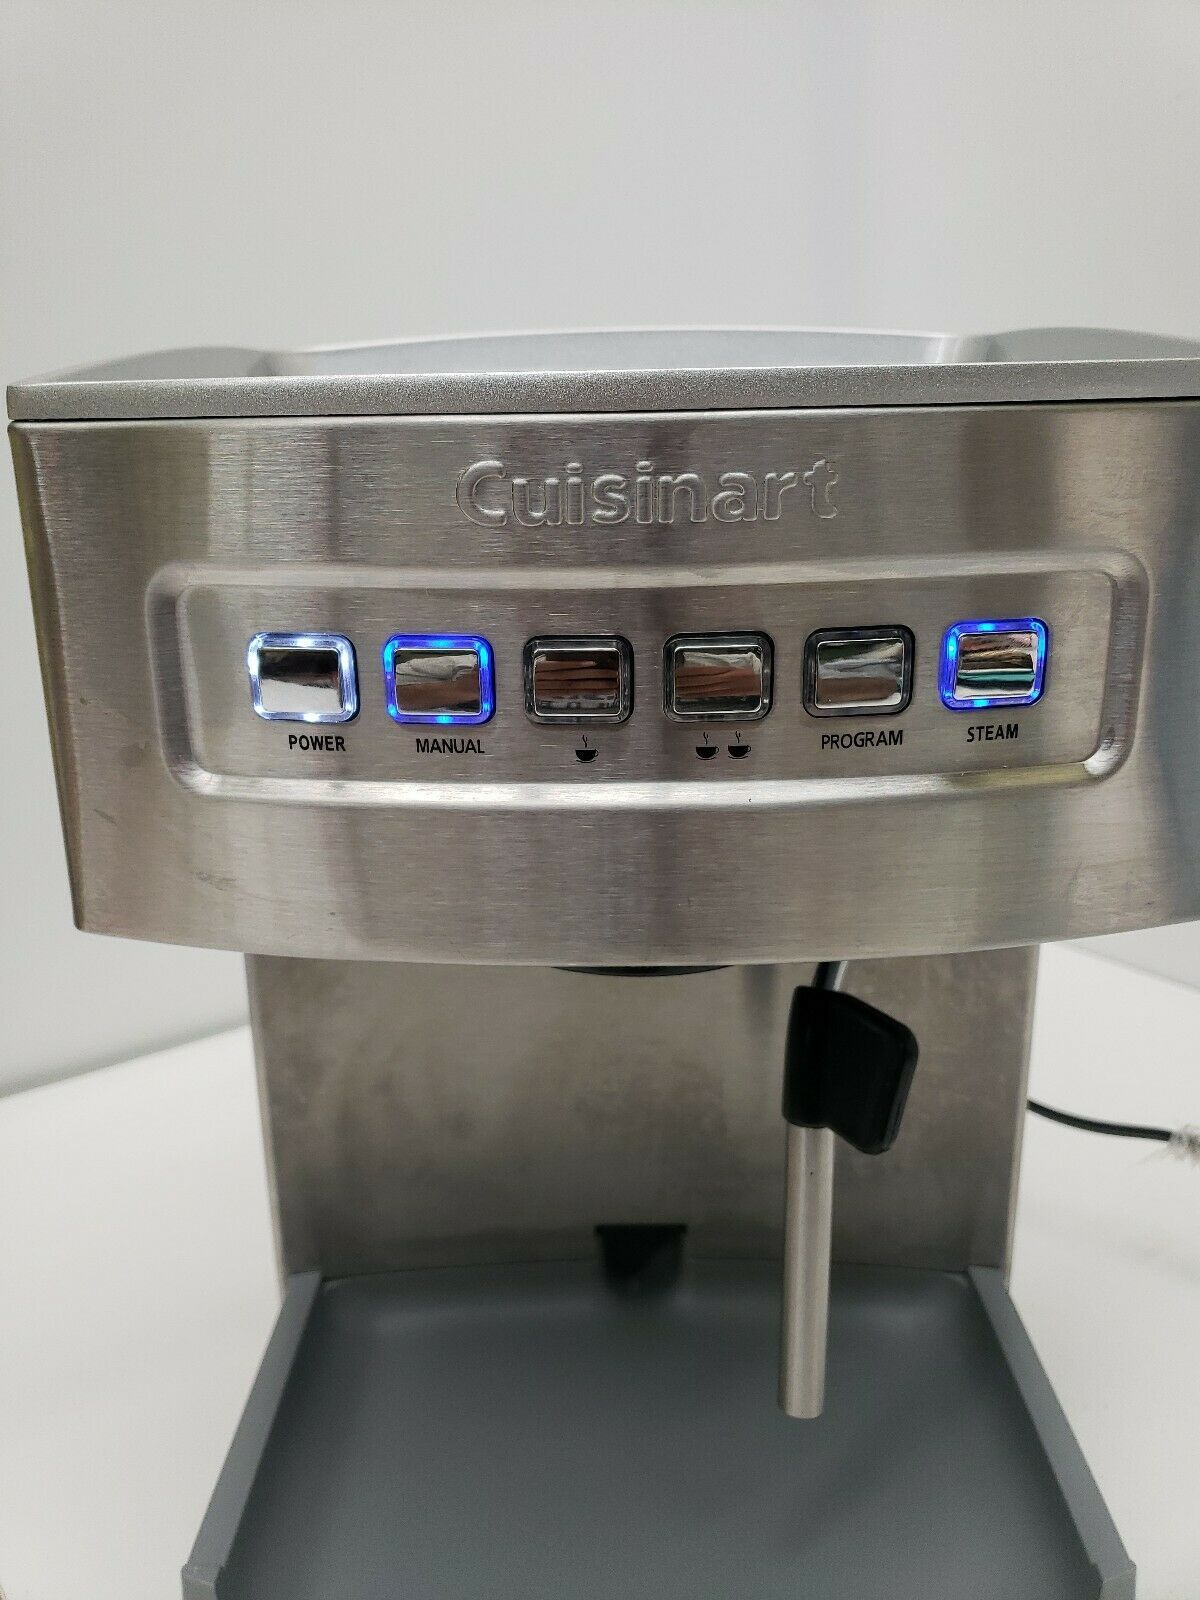 Cuisinart EM200 Programmable Espresso Maker ONLY machine